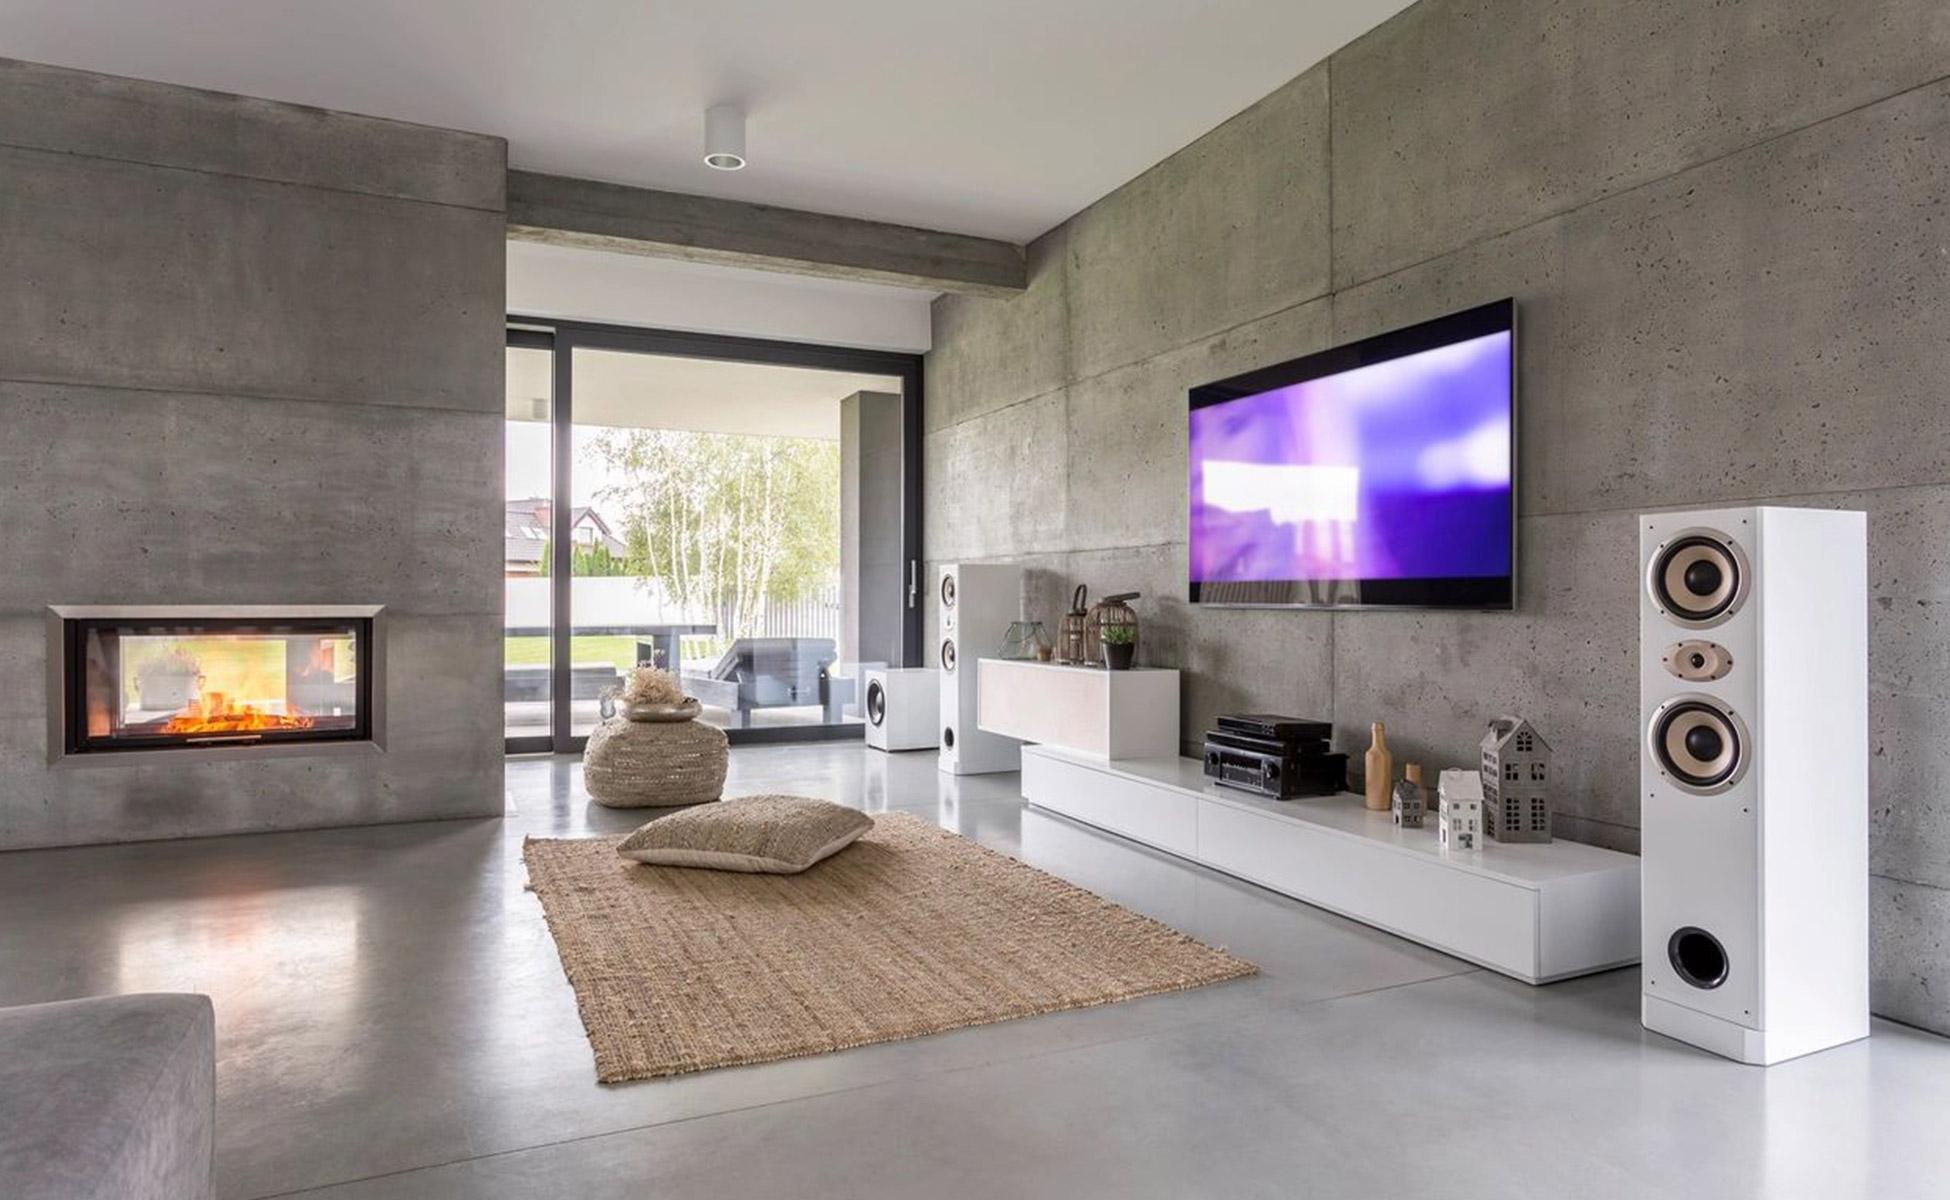 Home Theater installation in Los Angeles - LA Smart Home